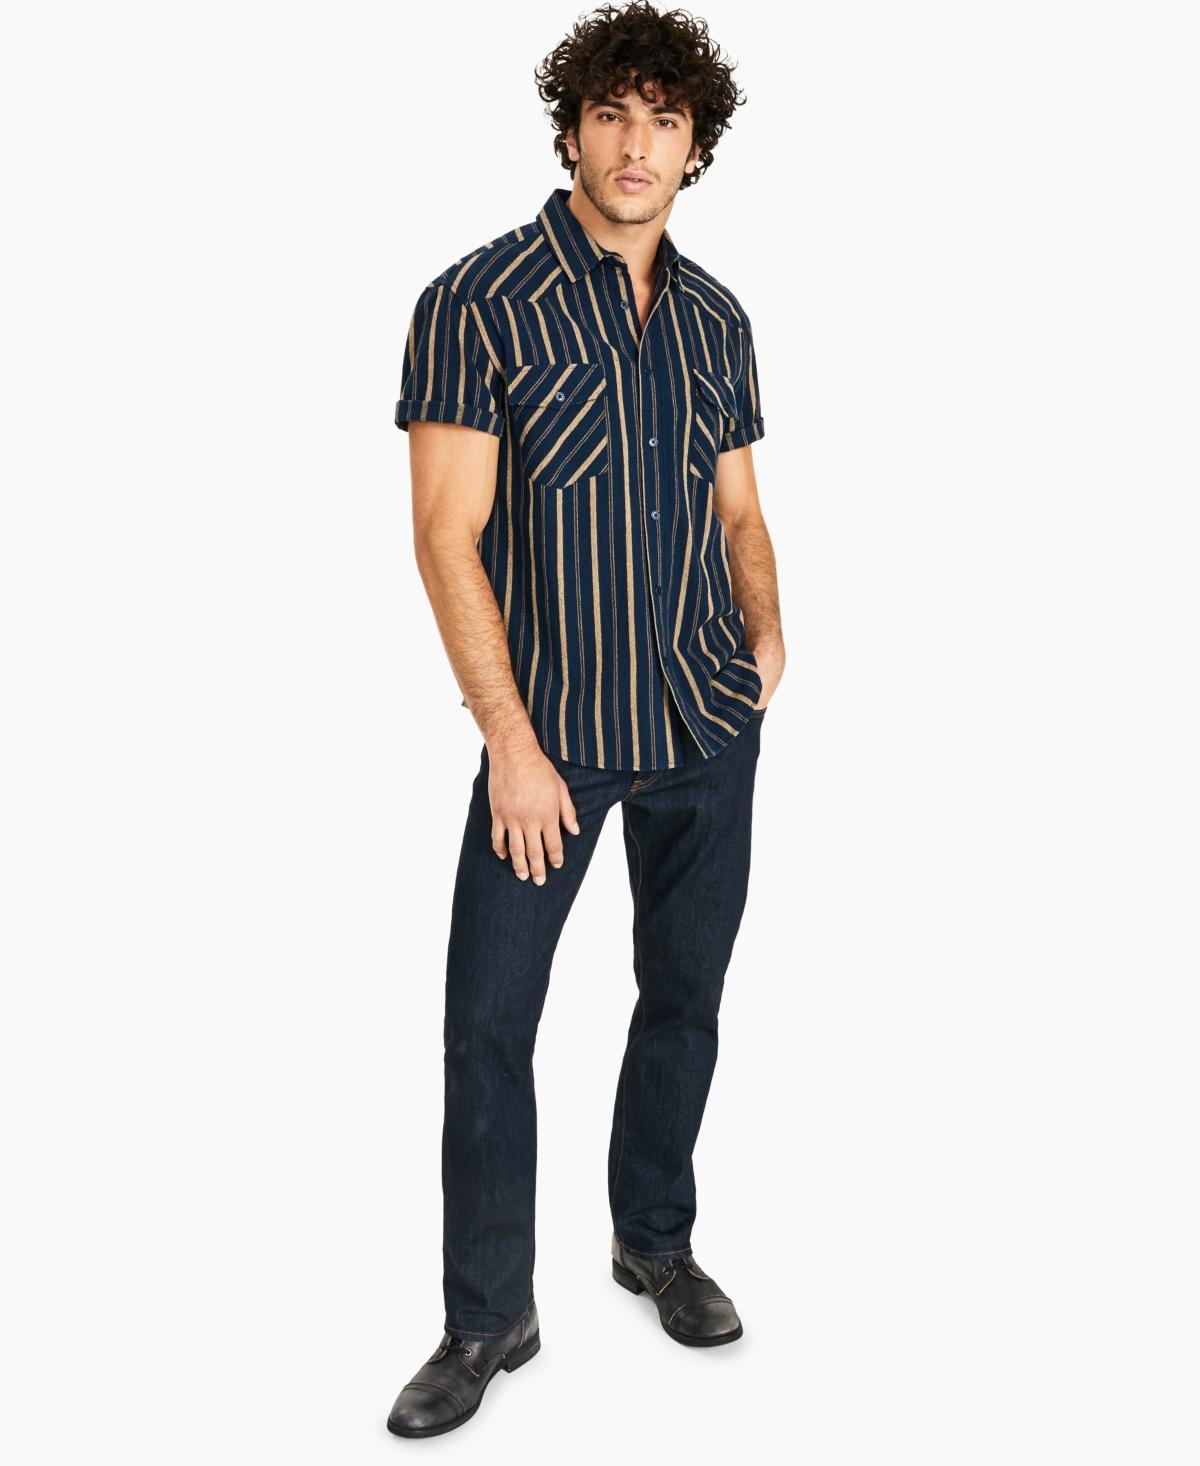 Crwth Men's Striped Shirt